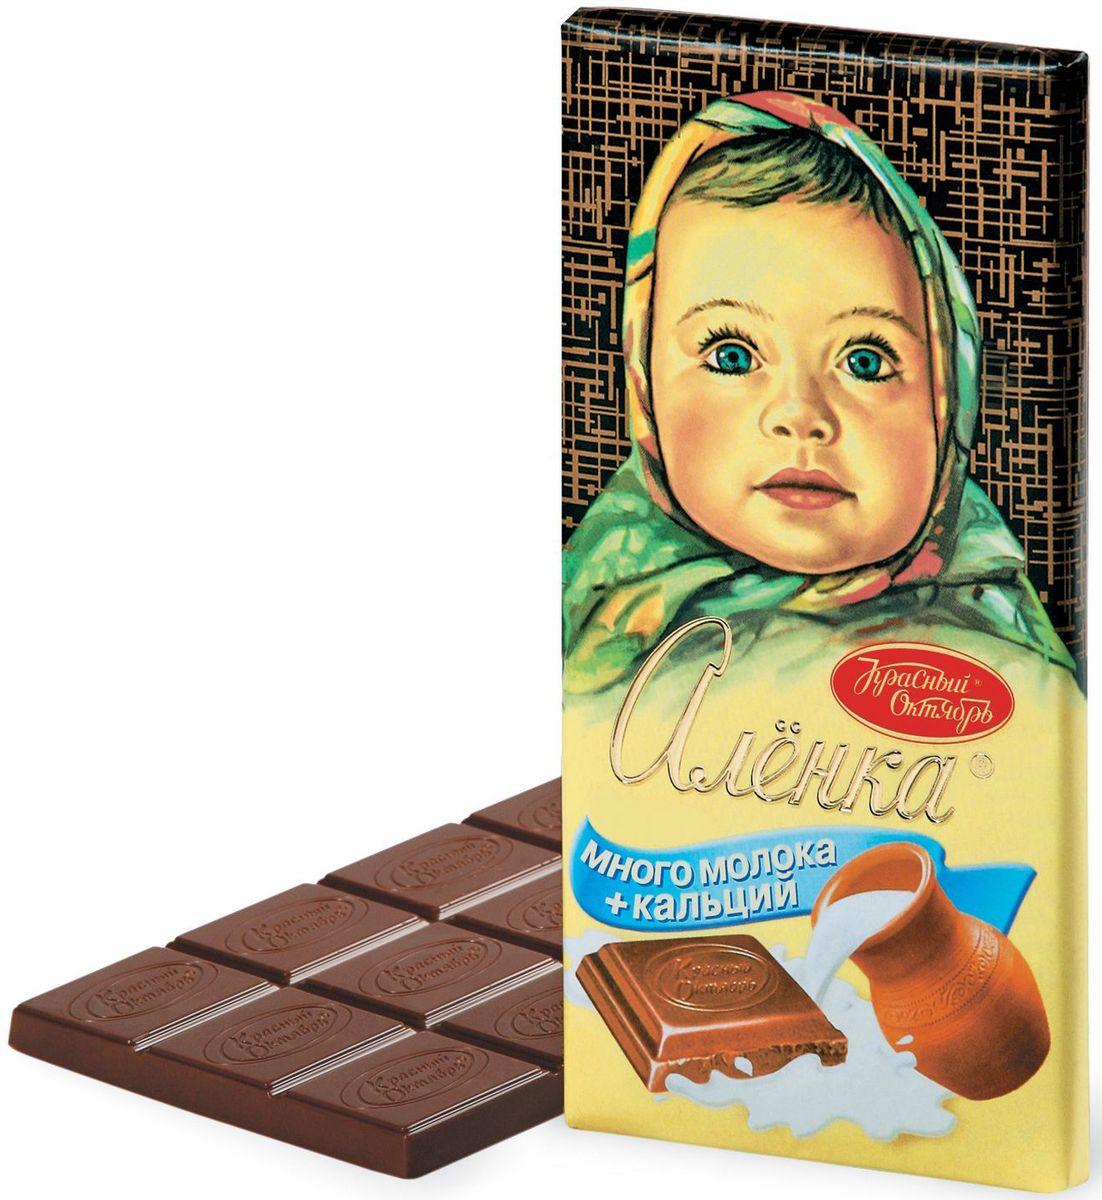 Красный Октябрь Аленка много молока молочный шоколад, 100 г куплю шкуры куницы 2014 год октябрь